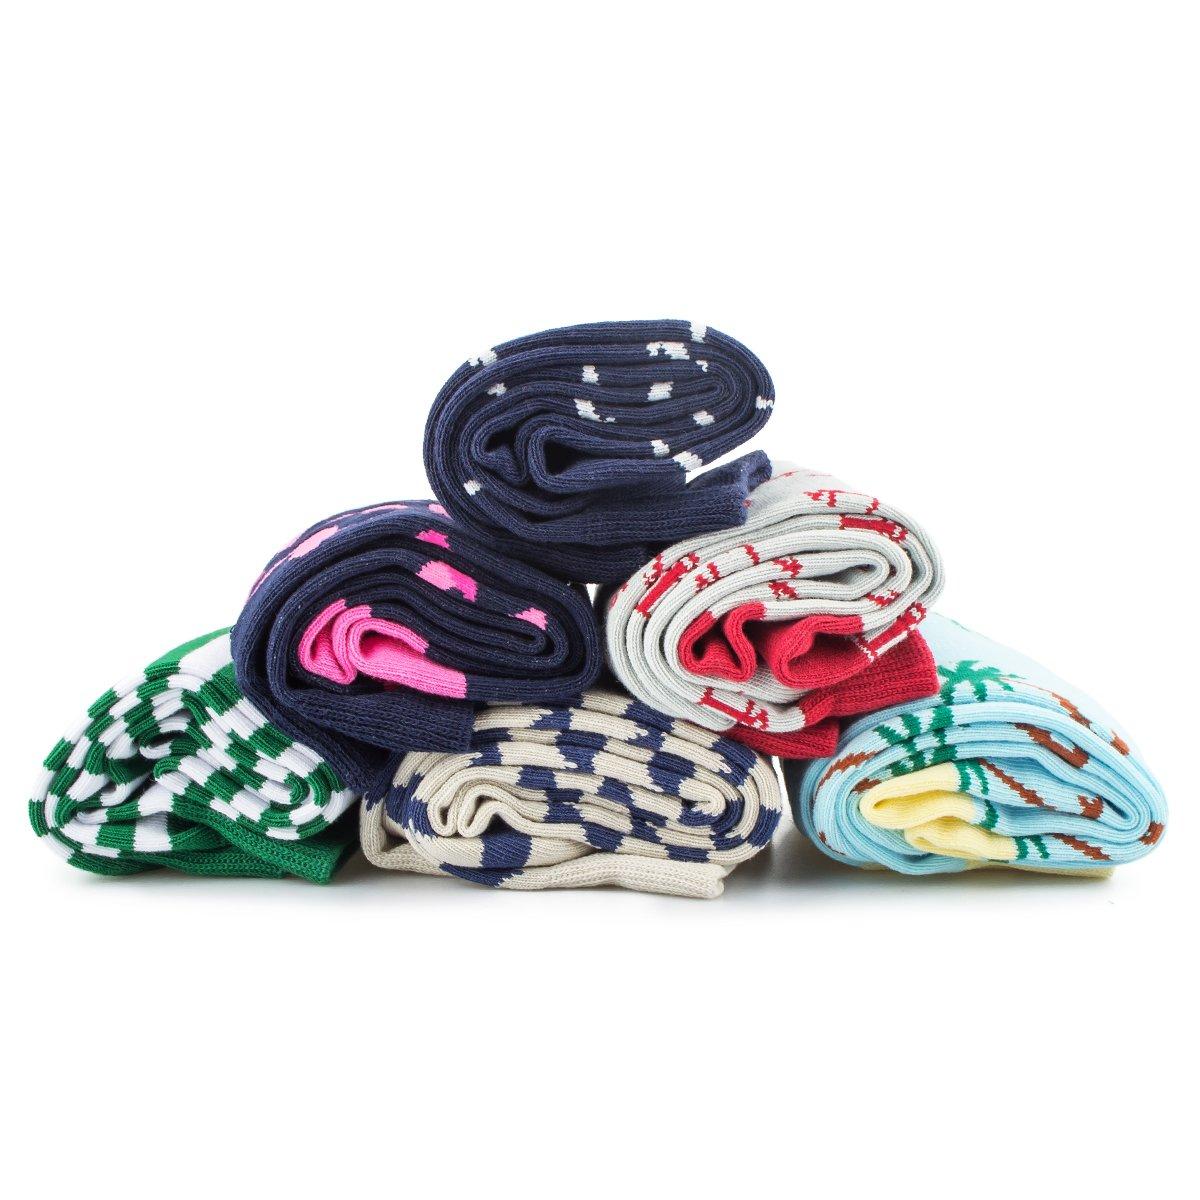 Tutast Men\'s Cotton Dress Socks Funny Socks - Fashion Colorful Patterned Crew Socks for Men, Size 7-13 (Fishhook)